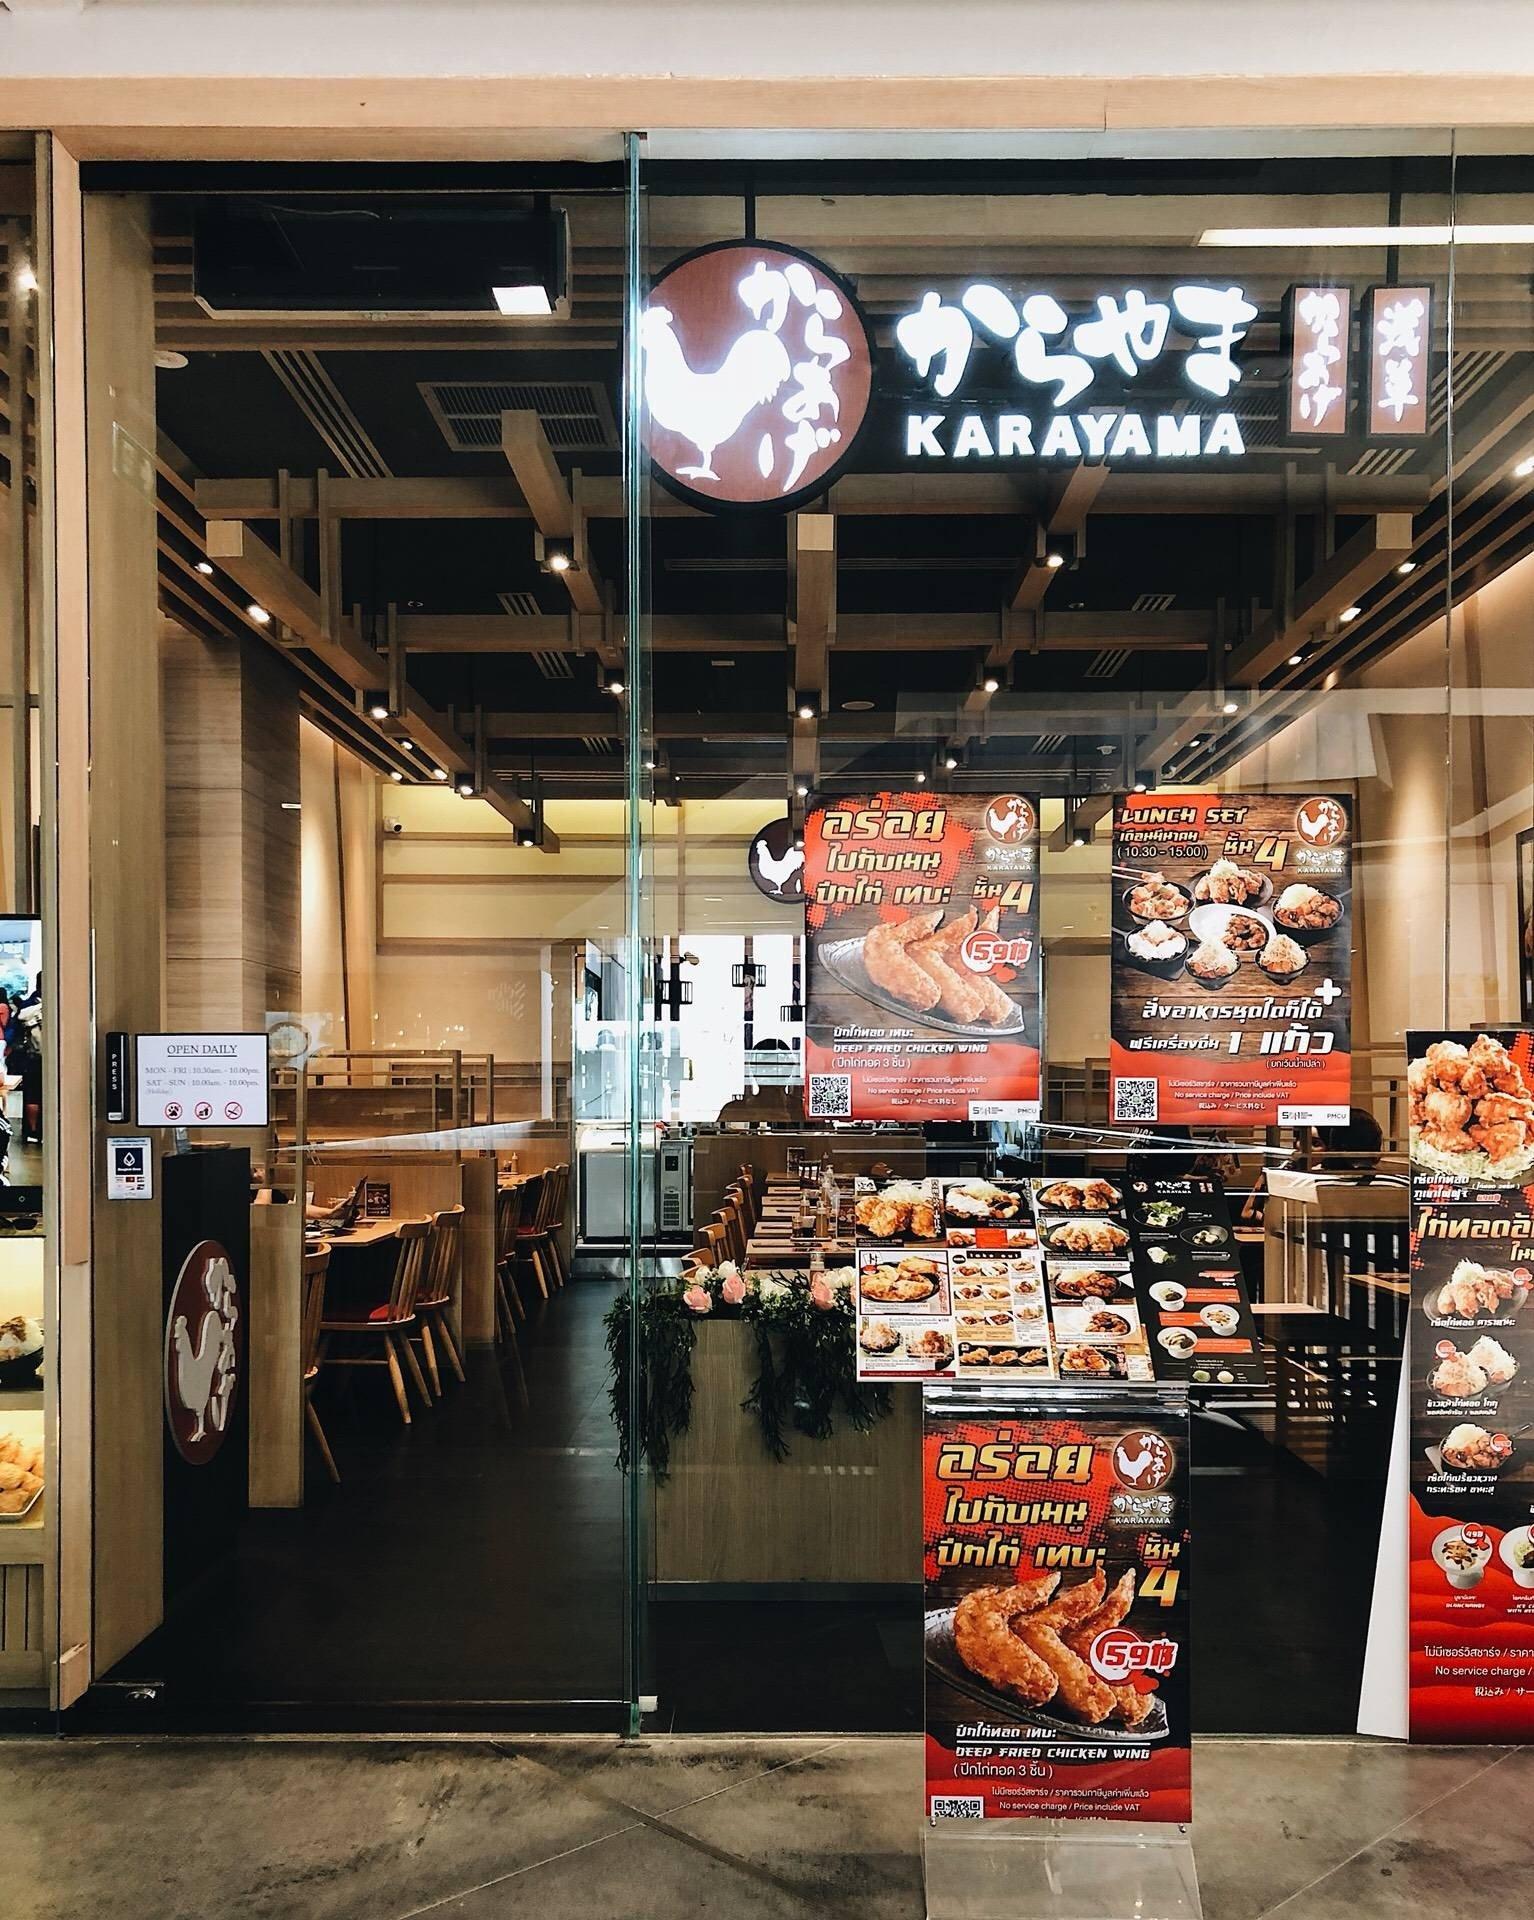 KARAYAMA JAPANESE FRIED CHICKEN Siam Square One